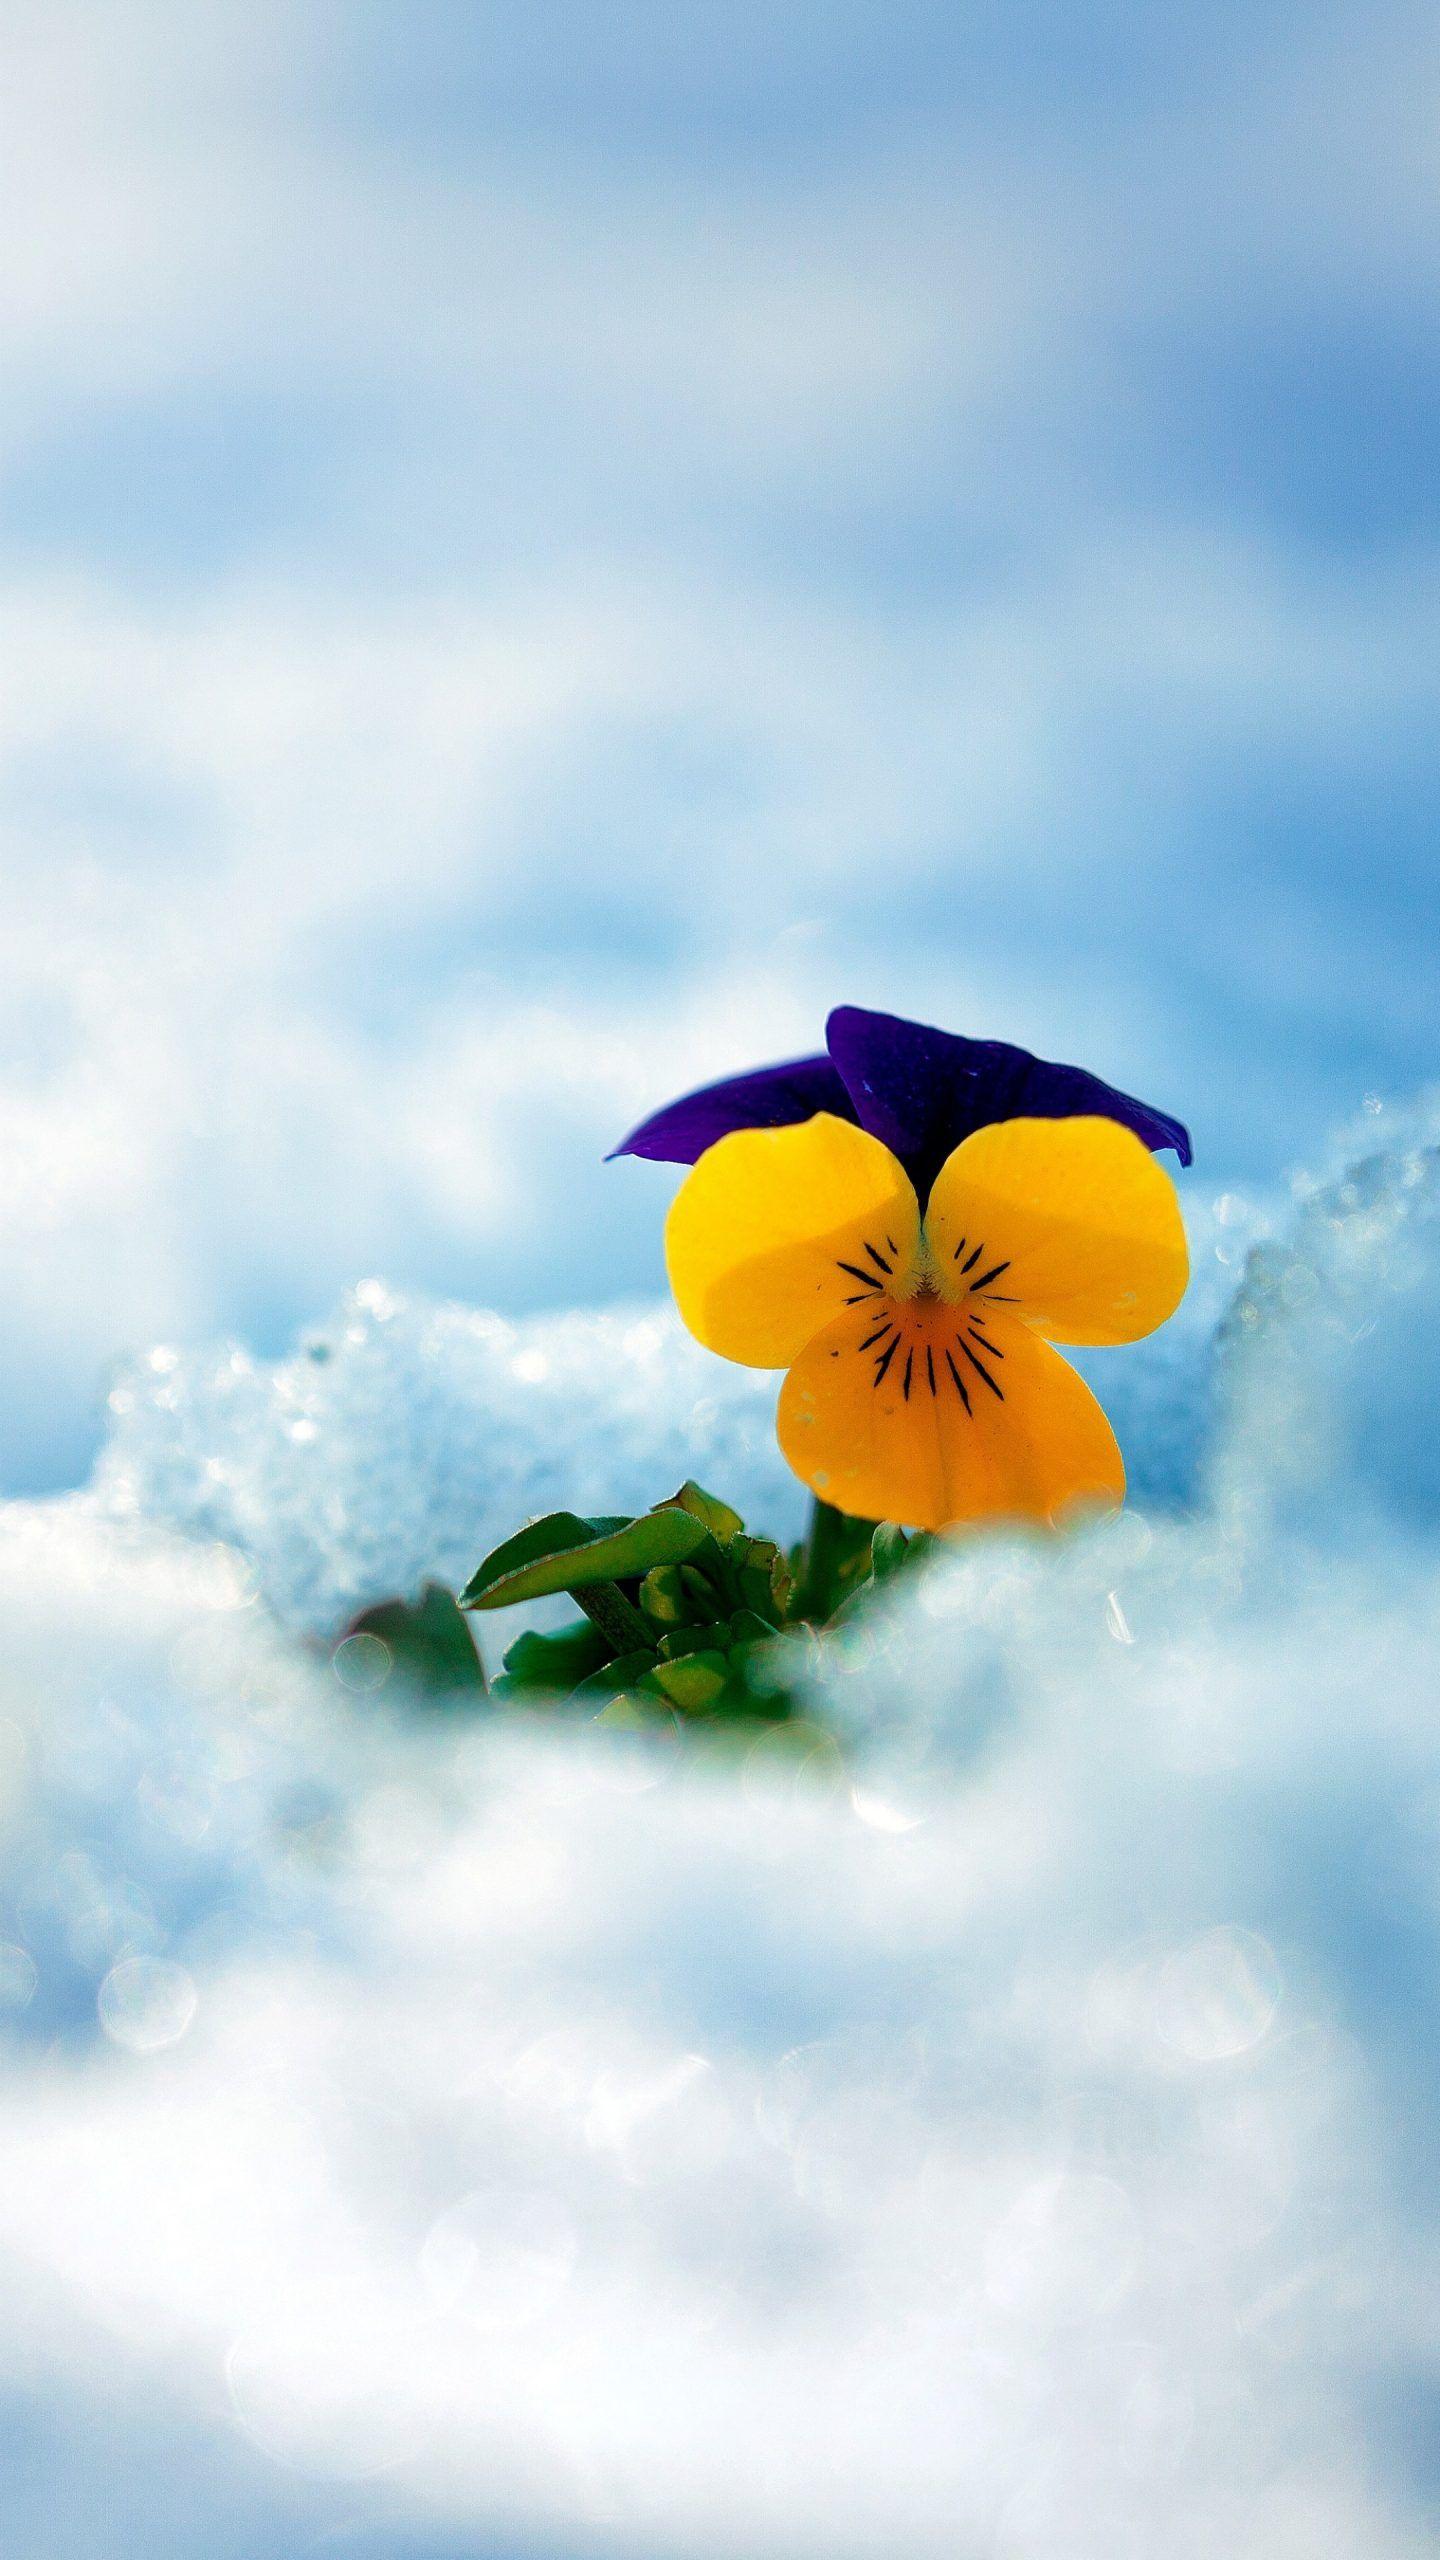 Flower In 2021 Amazing Flowers Flower Drawing Tumblr Yellow Flowers Fantastic yellow flower hd wallpaper